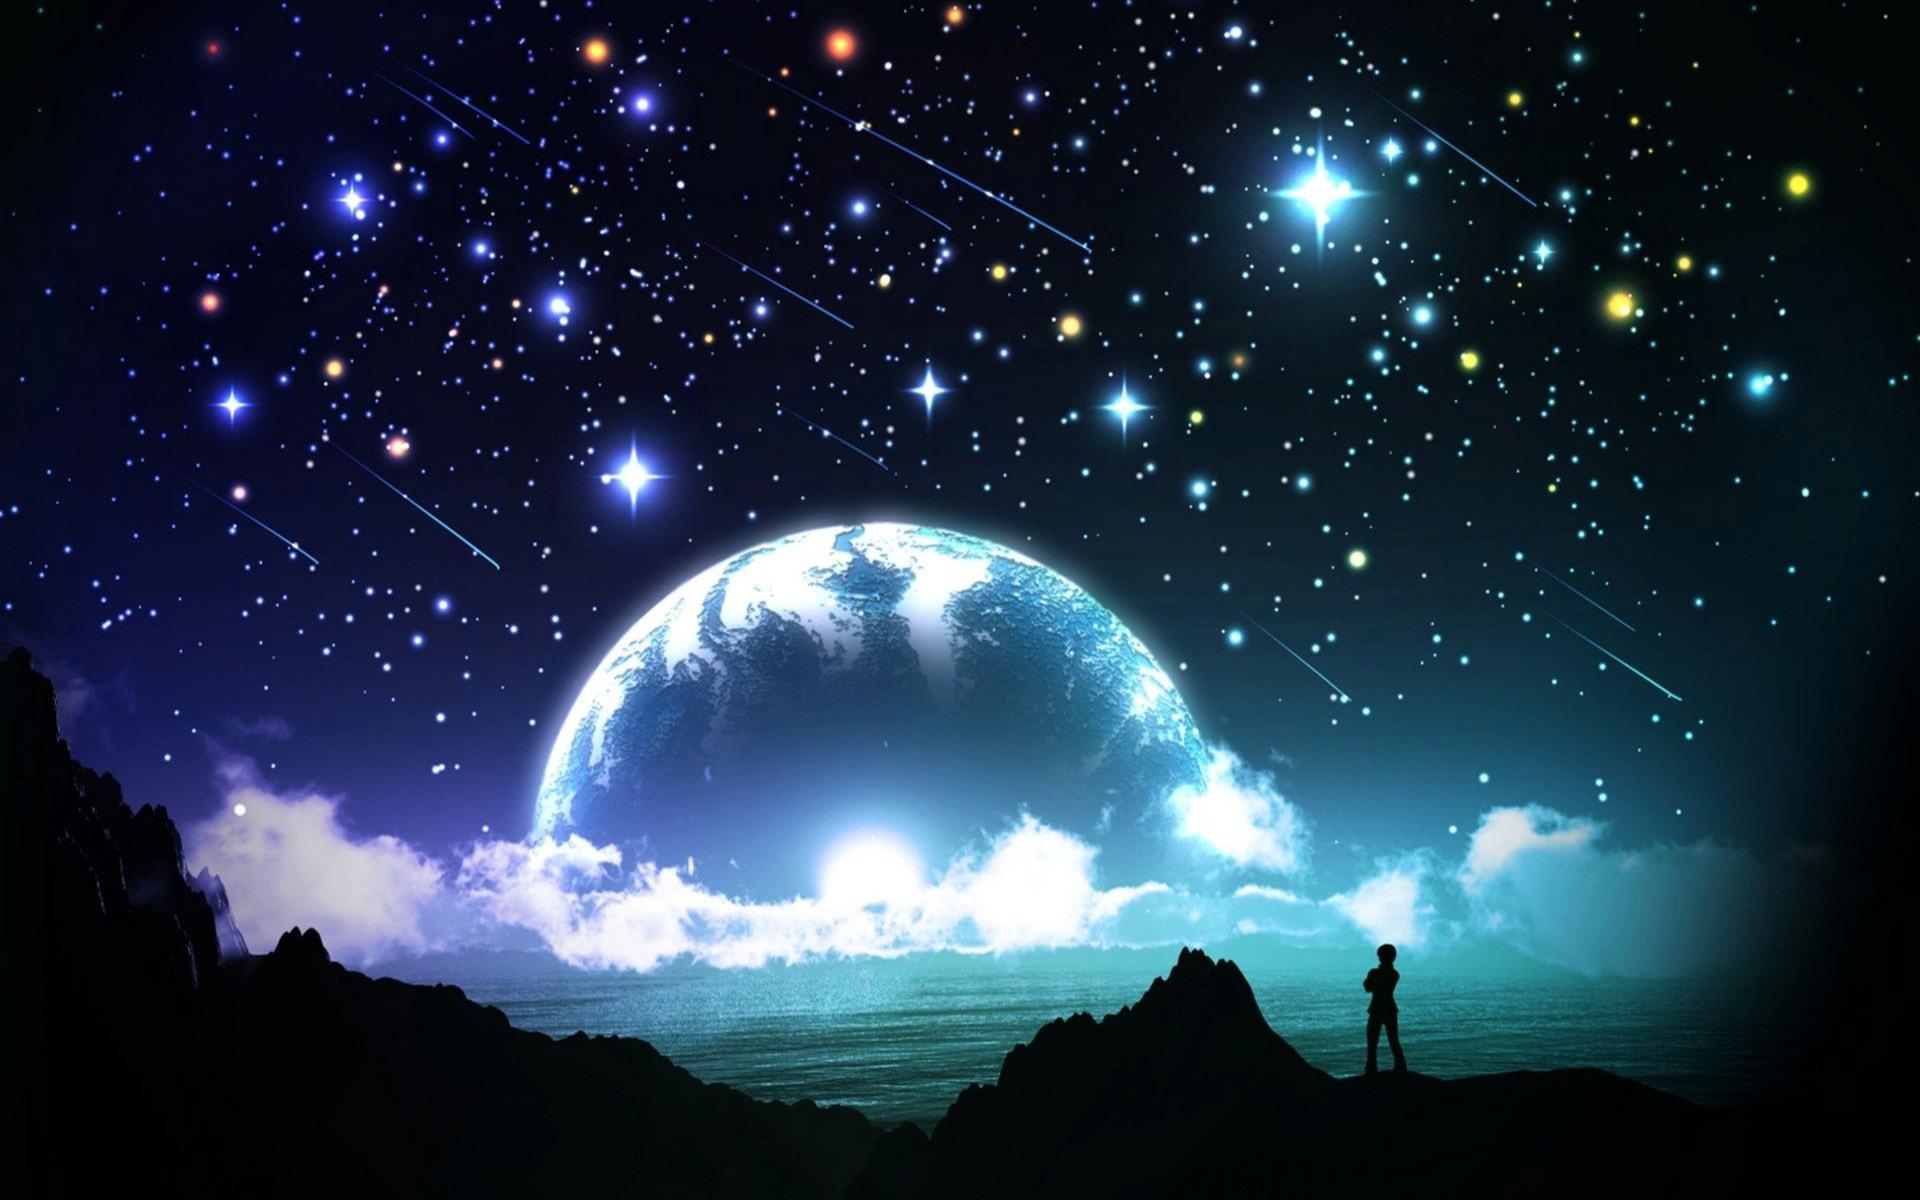 Bright night sky wallpaper 19601 1920x1200